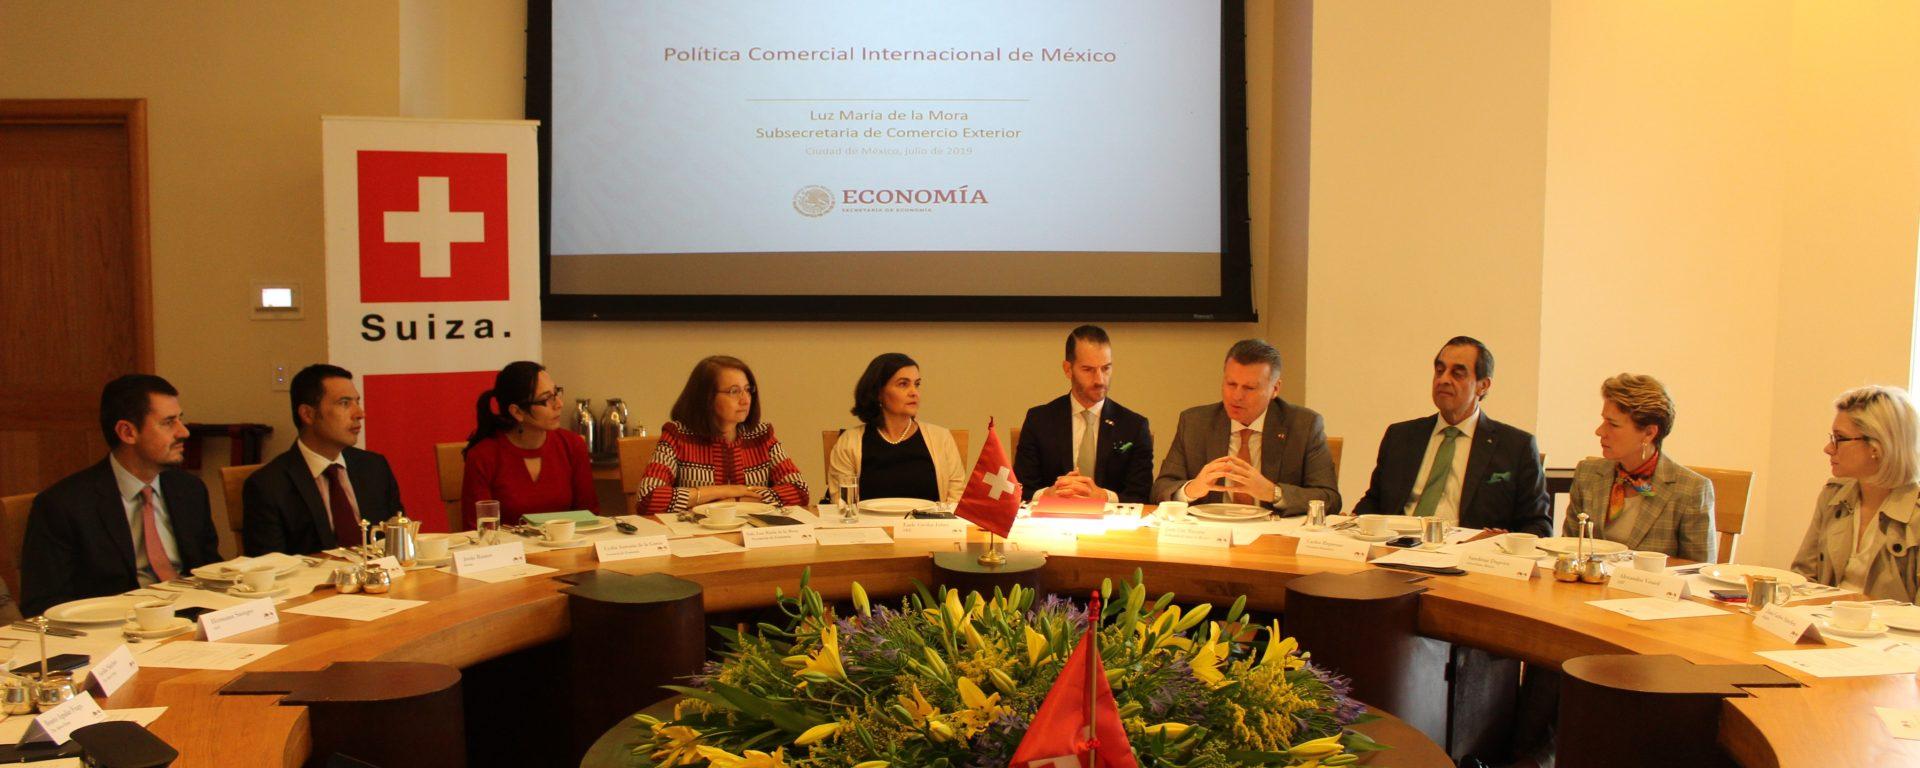 Roundtable with Mexico's Vice Ministry of Foreign Trade, Luz María de la Mora